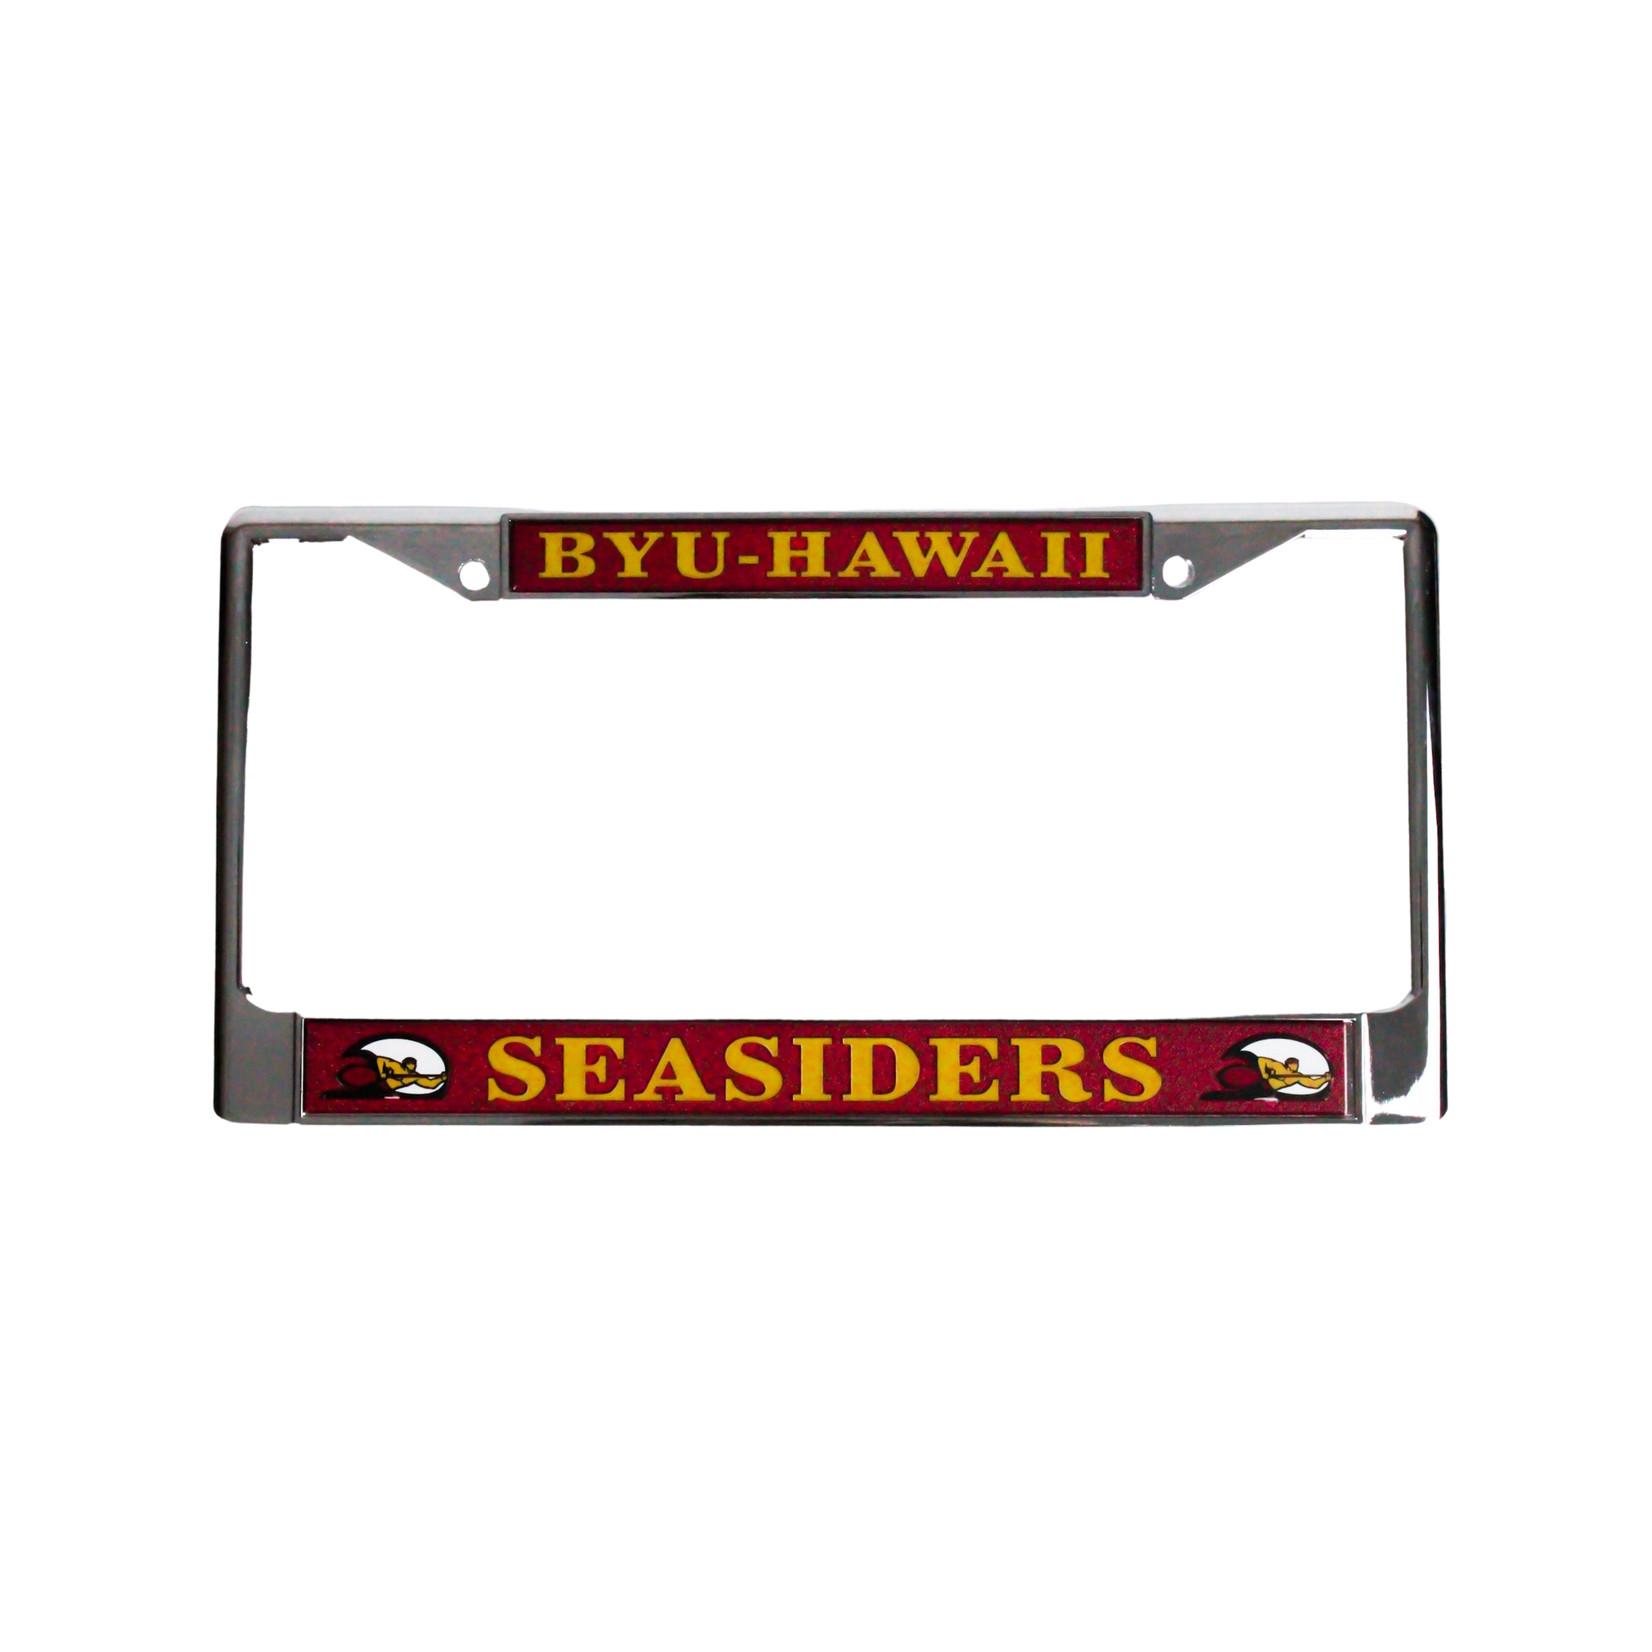 R&D BYU HAWAII LICENSE PLATE Chrome Insert Frame